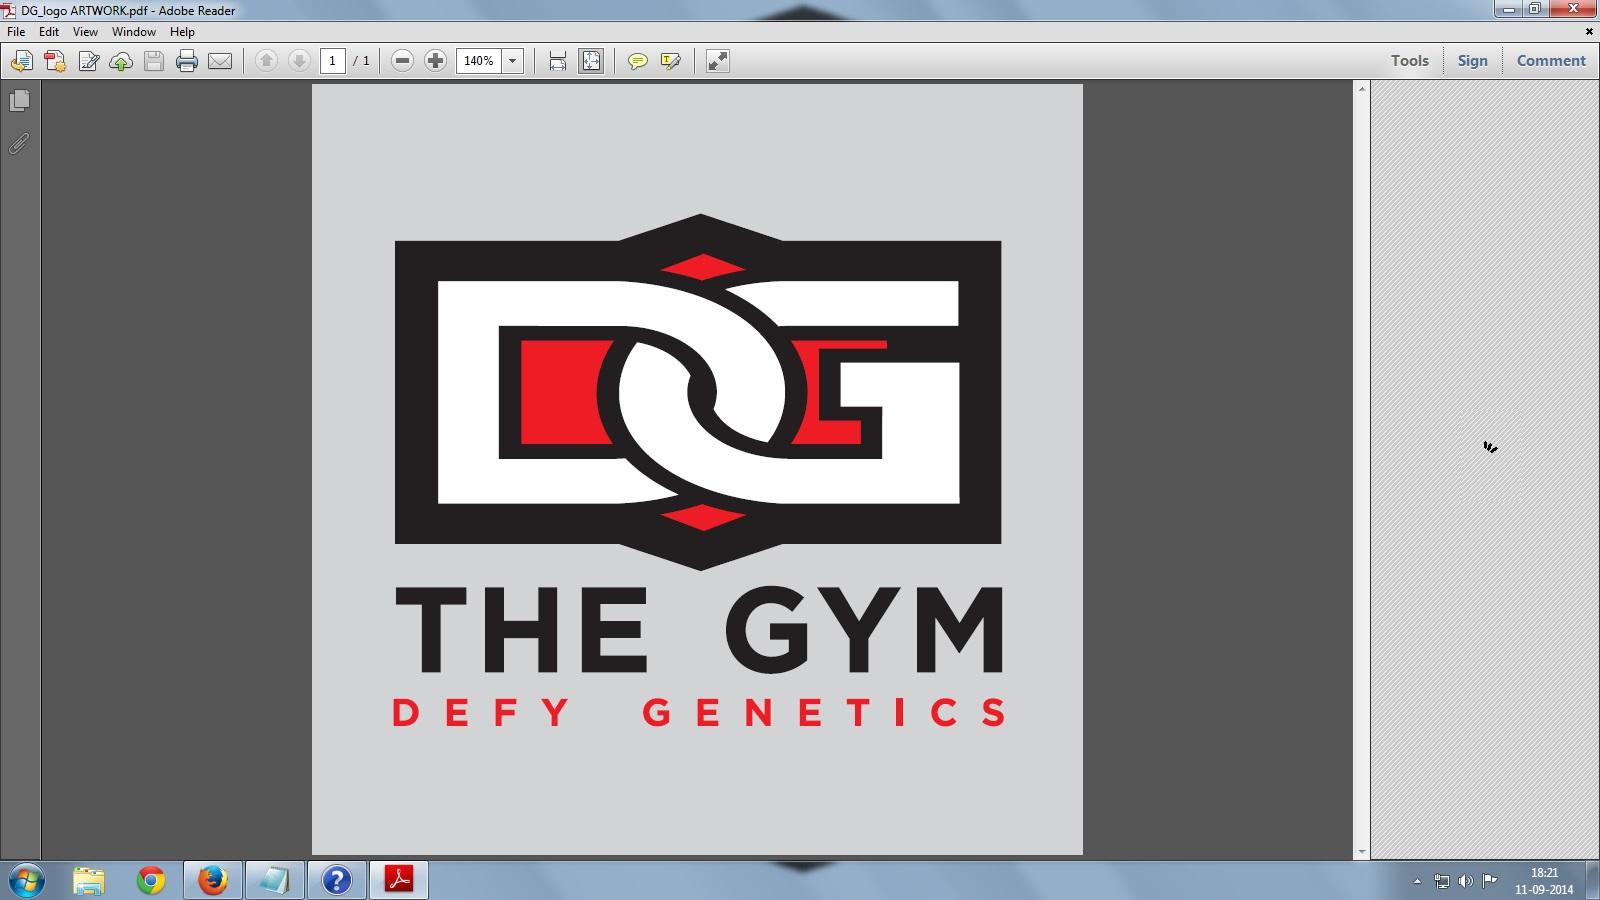 d.g.the gym